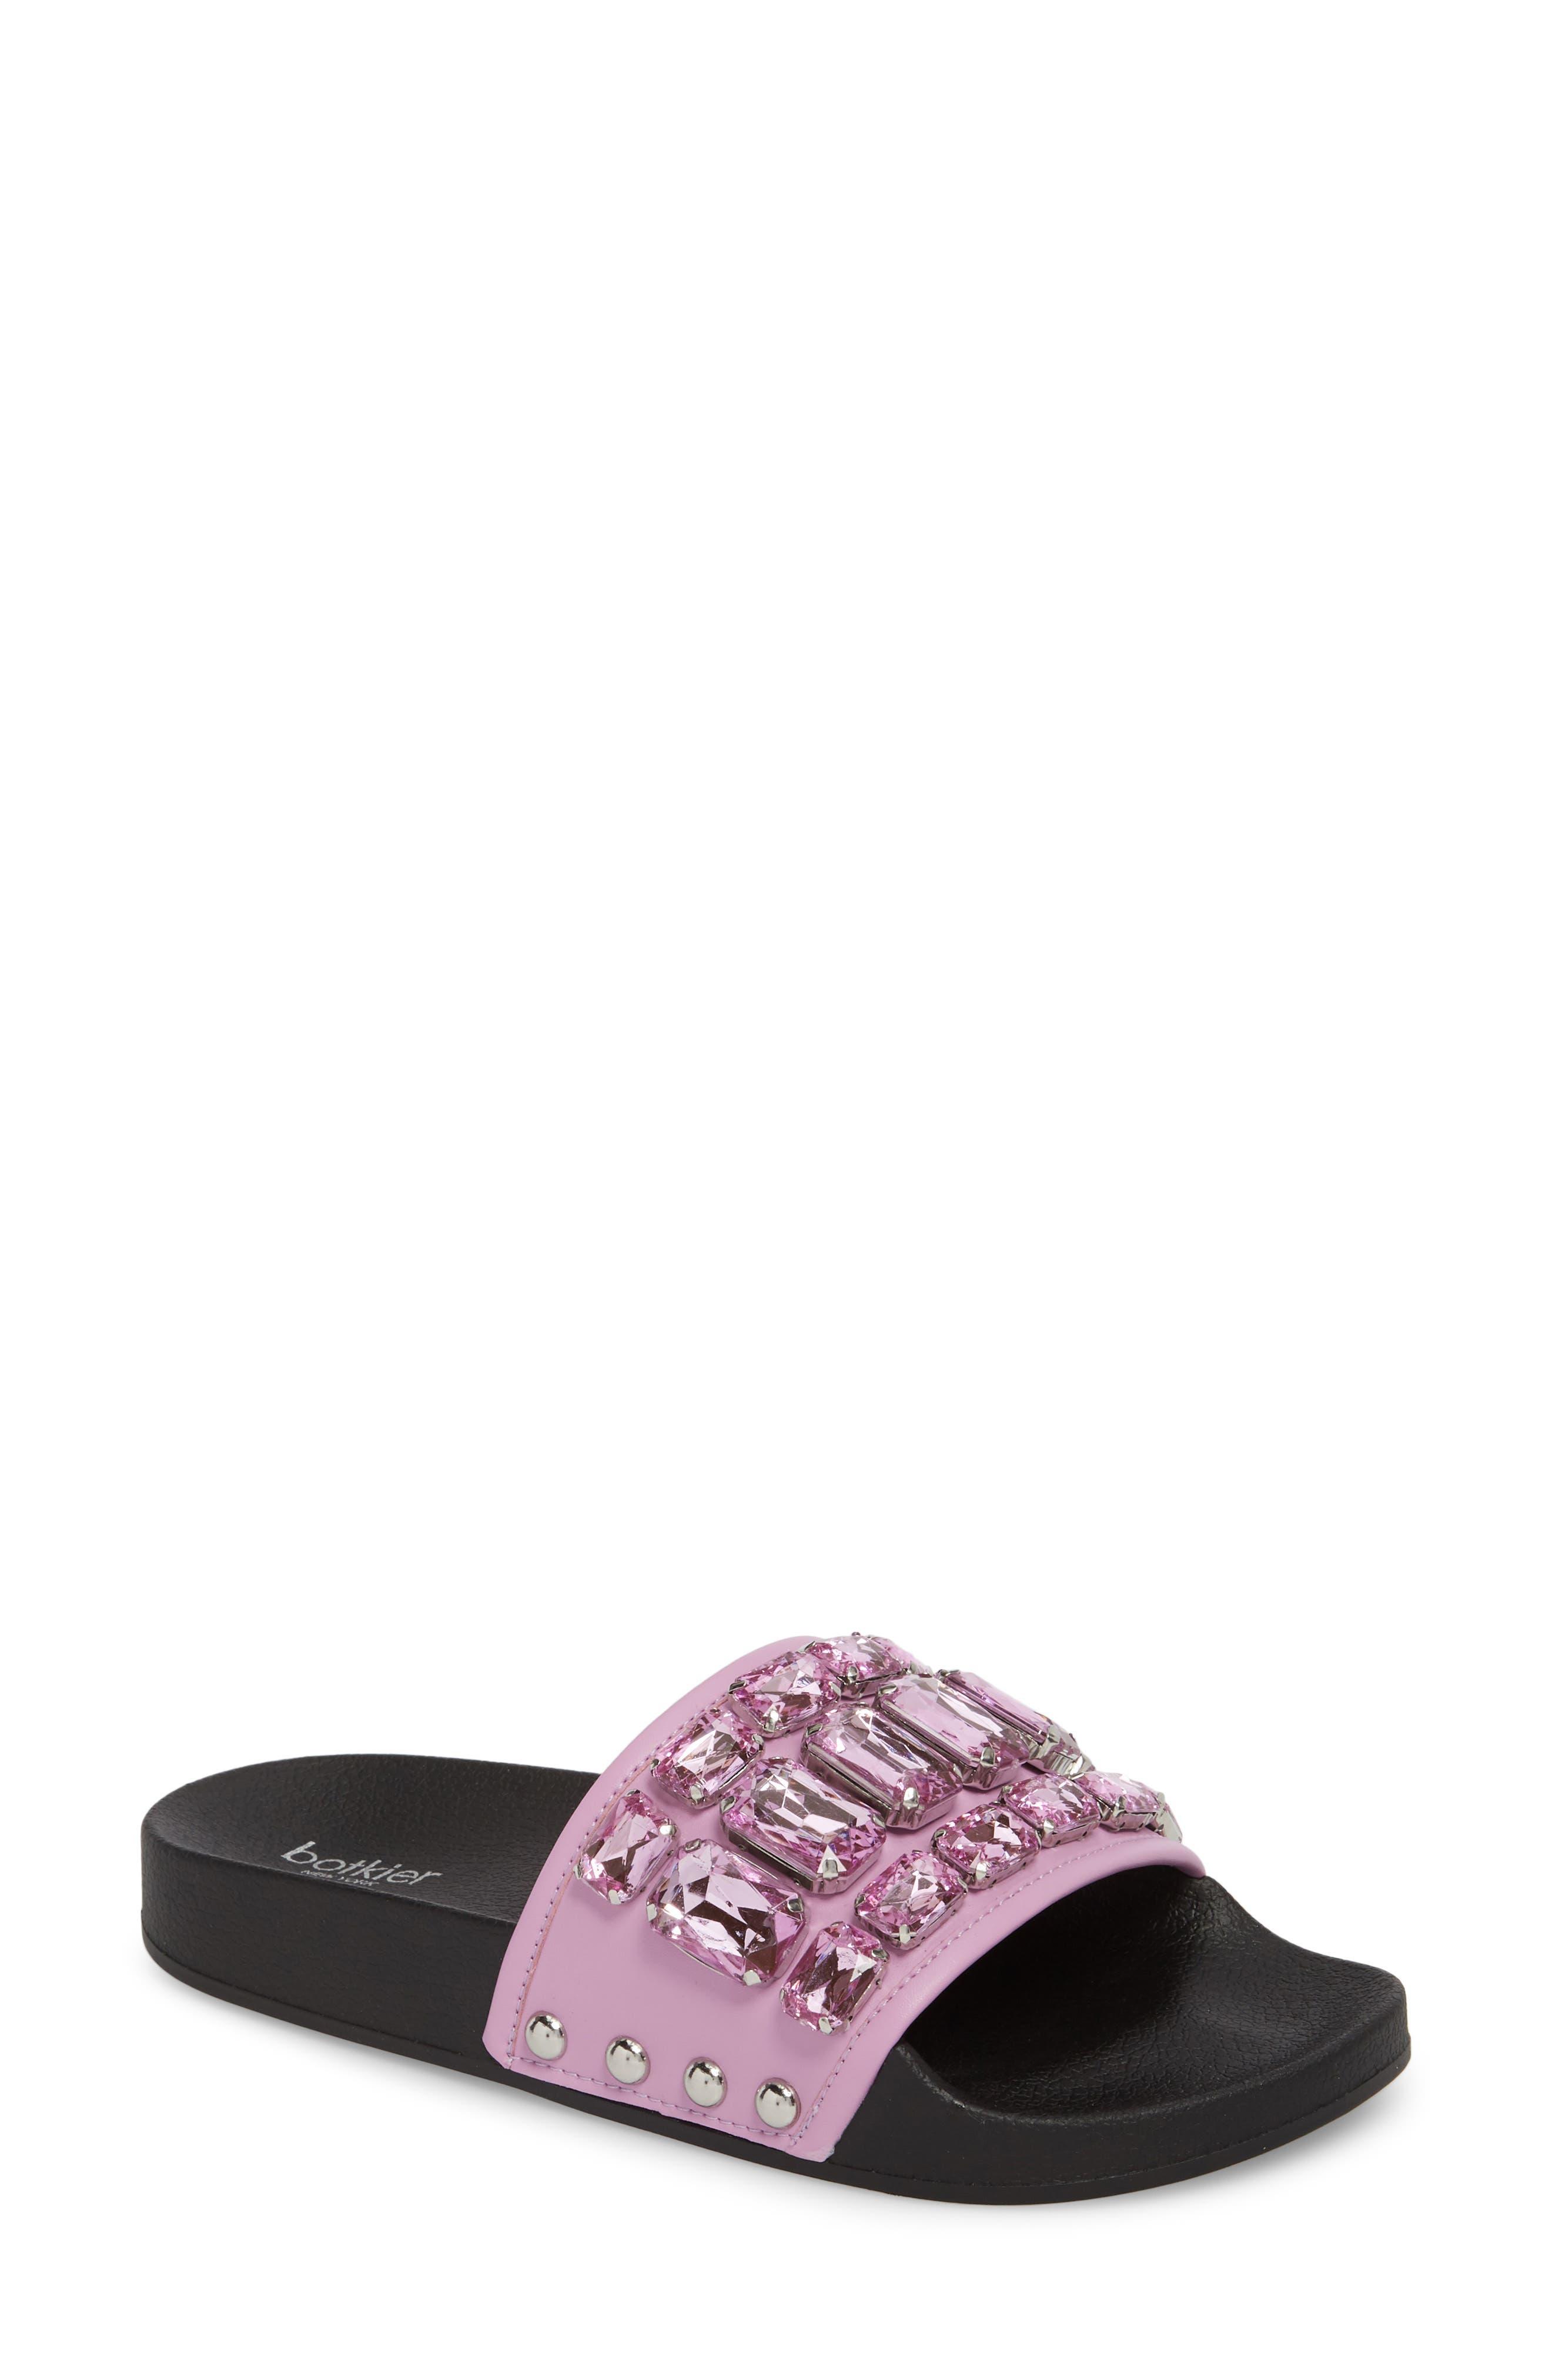 Botkier Freda Crystal Slide Sandal, Purple